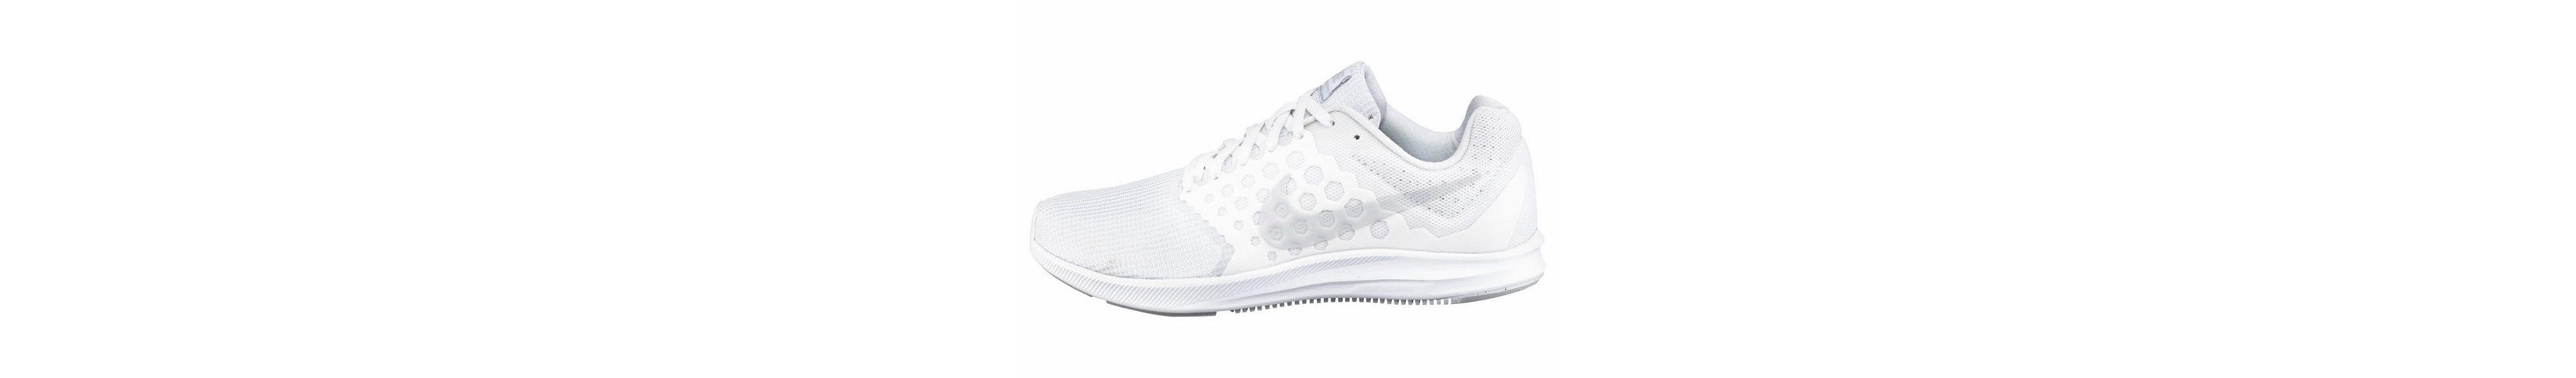 Besuchen Verkauf Online Nike Wmns Downshifter 7 Laufschuh Beste Günstig Online Freies Verschiffen Footlocker ECnSp